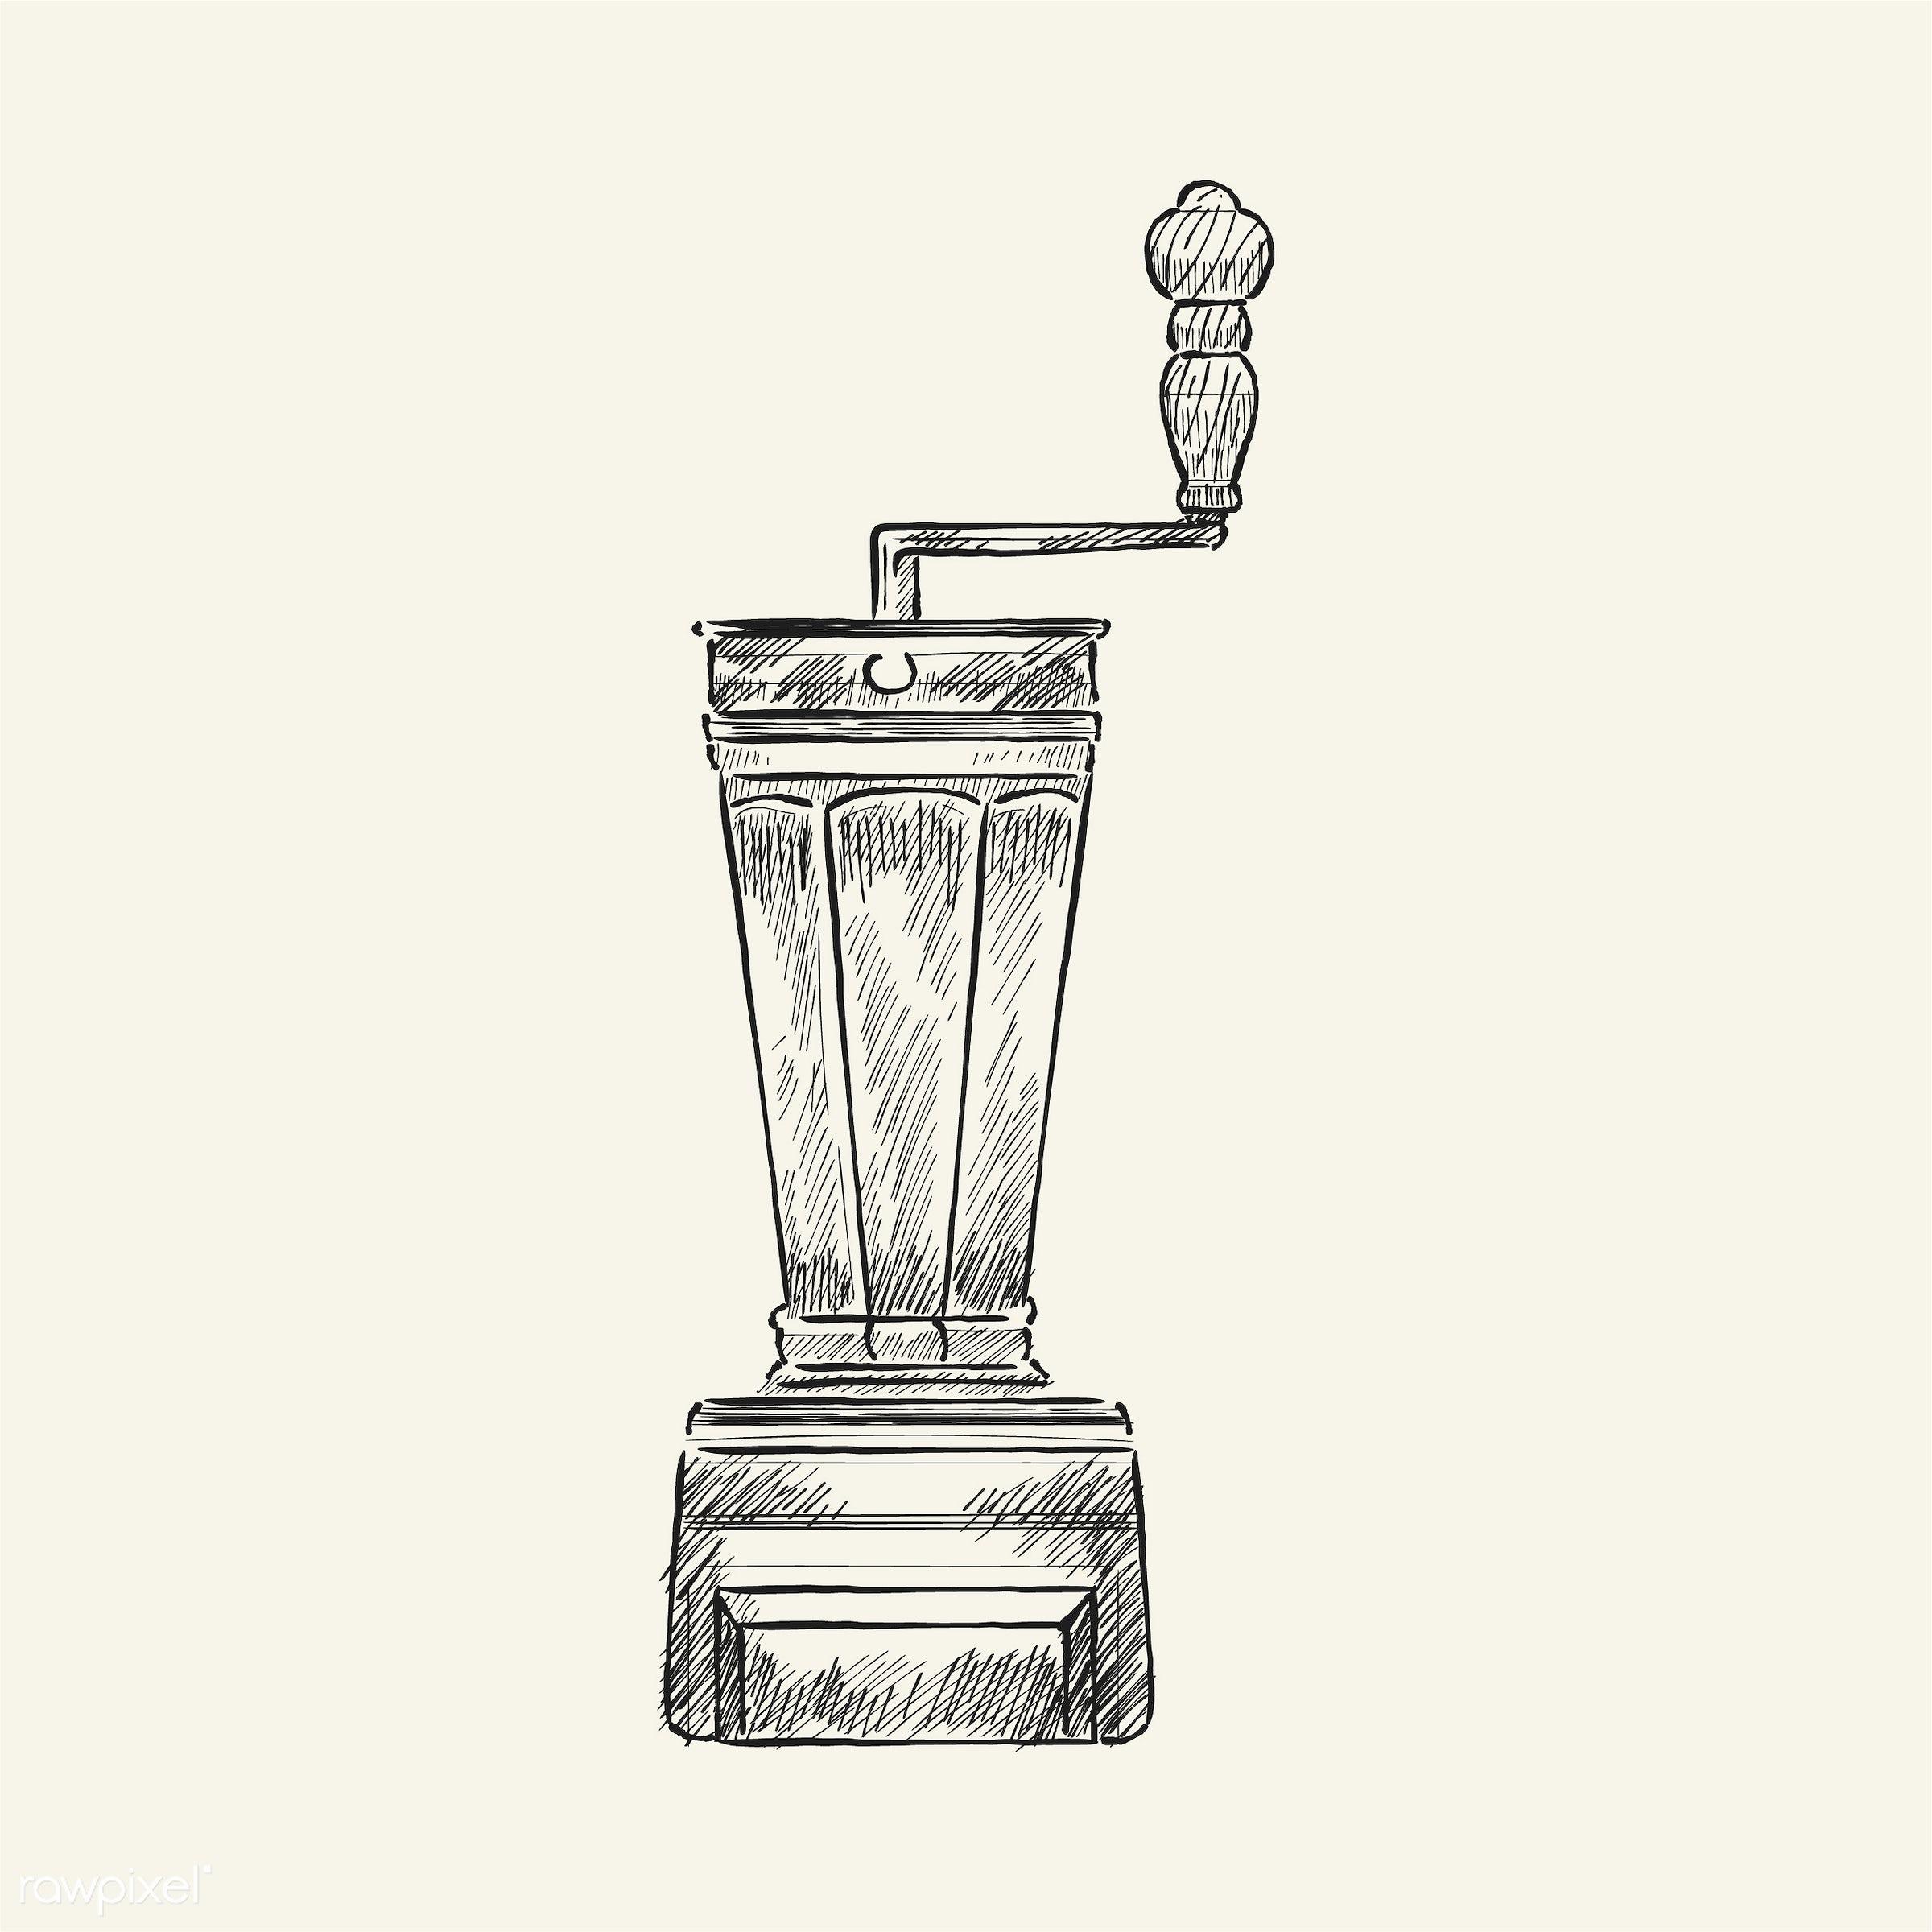 Vintage illustration of a coffee grinder - antique, aroma, beverage, black, cafe, coffee, coffee grinder, coffee shop,...